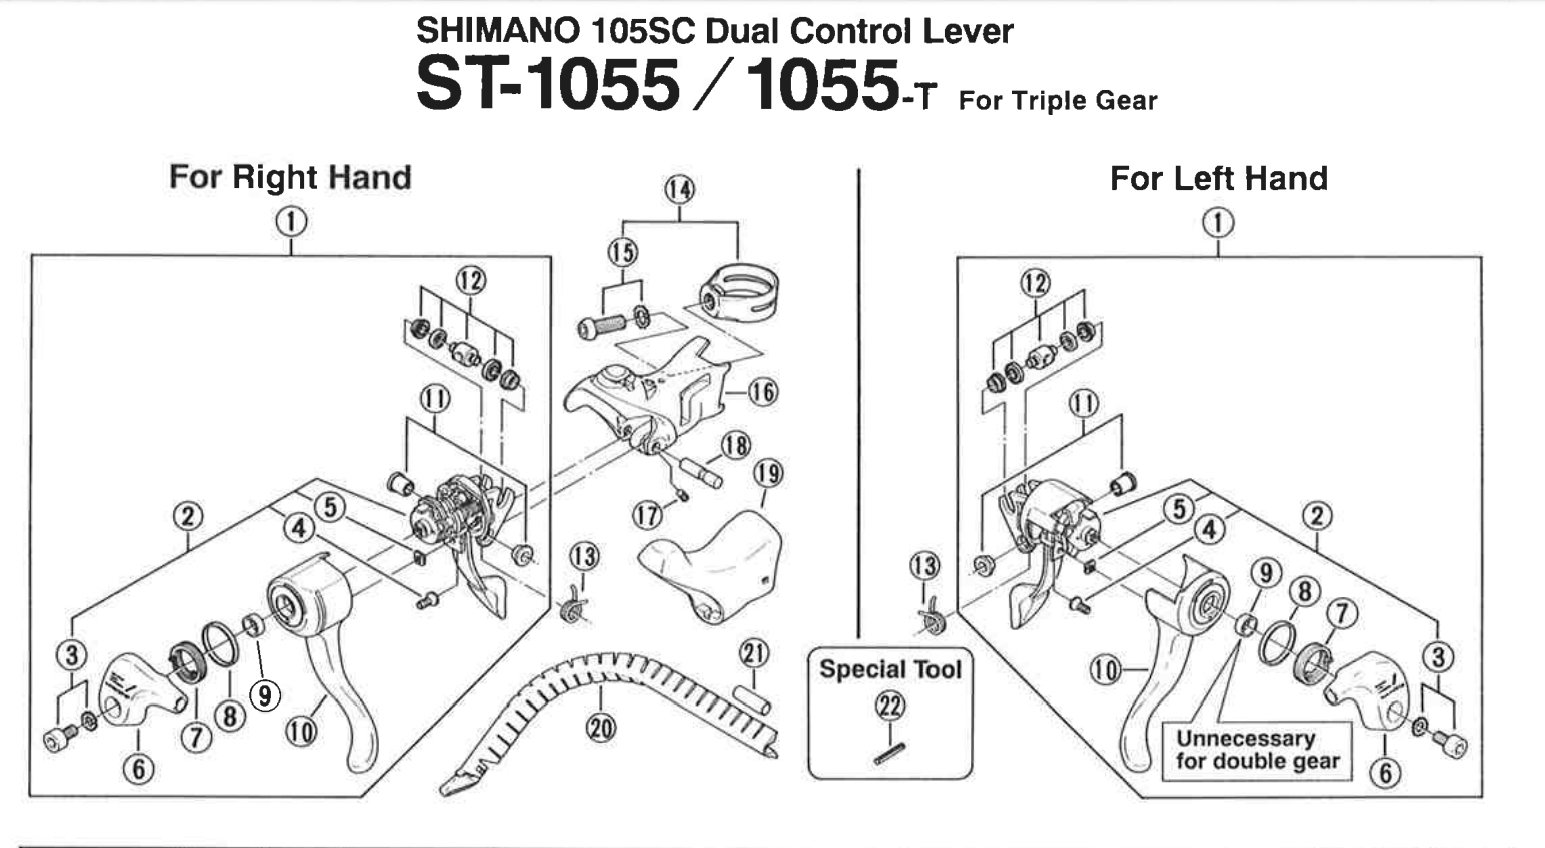 Brake Lever BL-6400 Shimano 600 Ultegra only Right Tricolore New